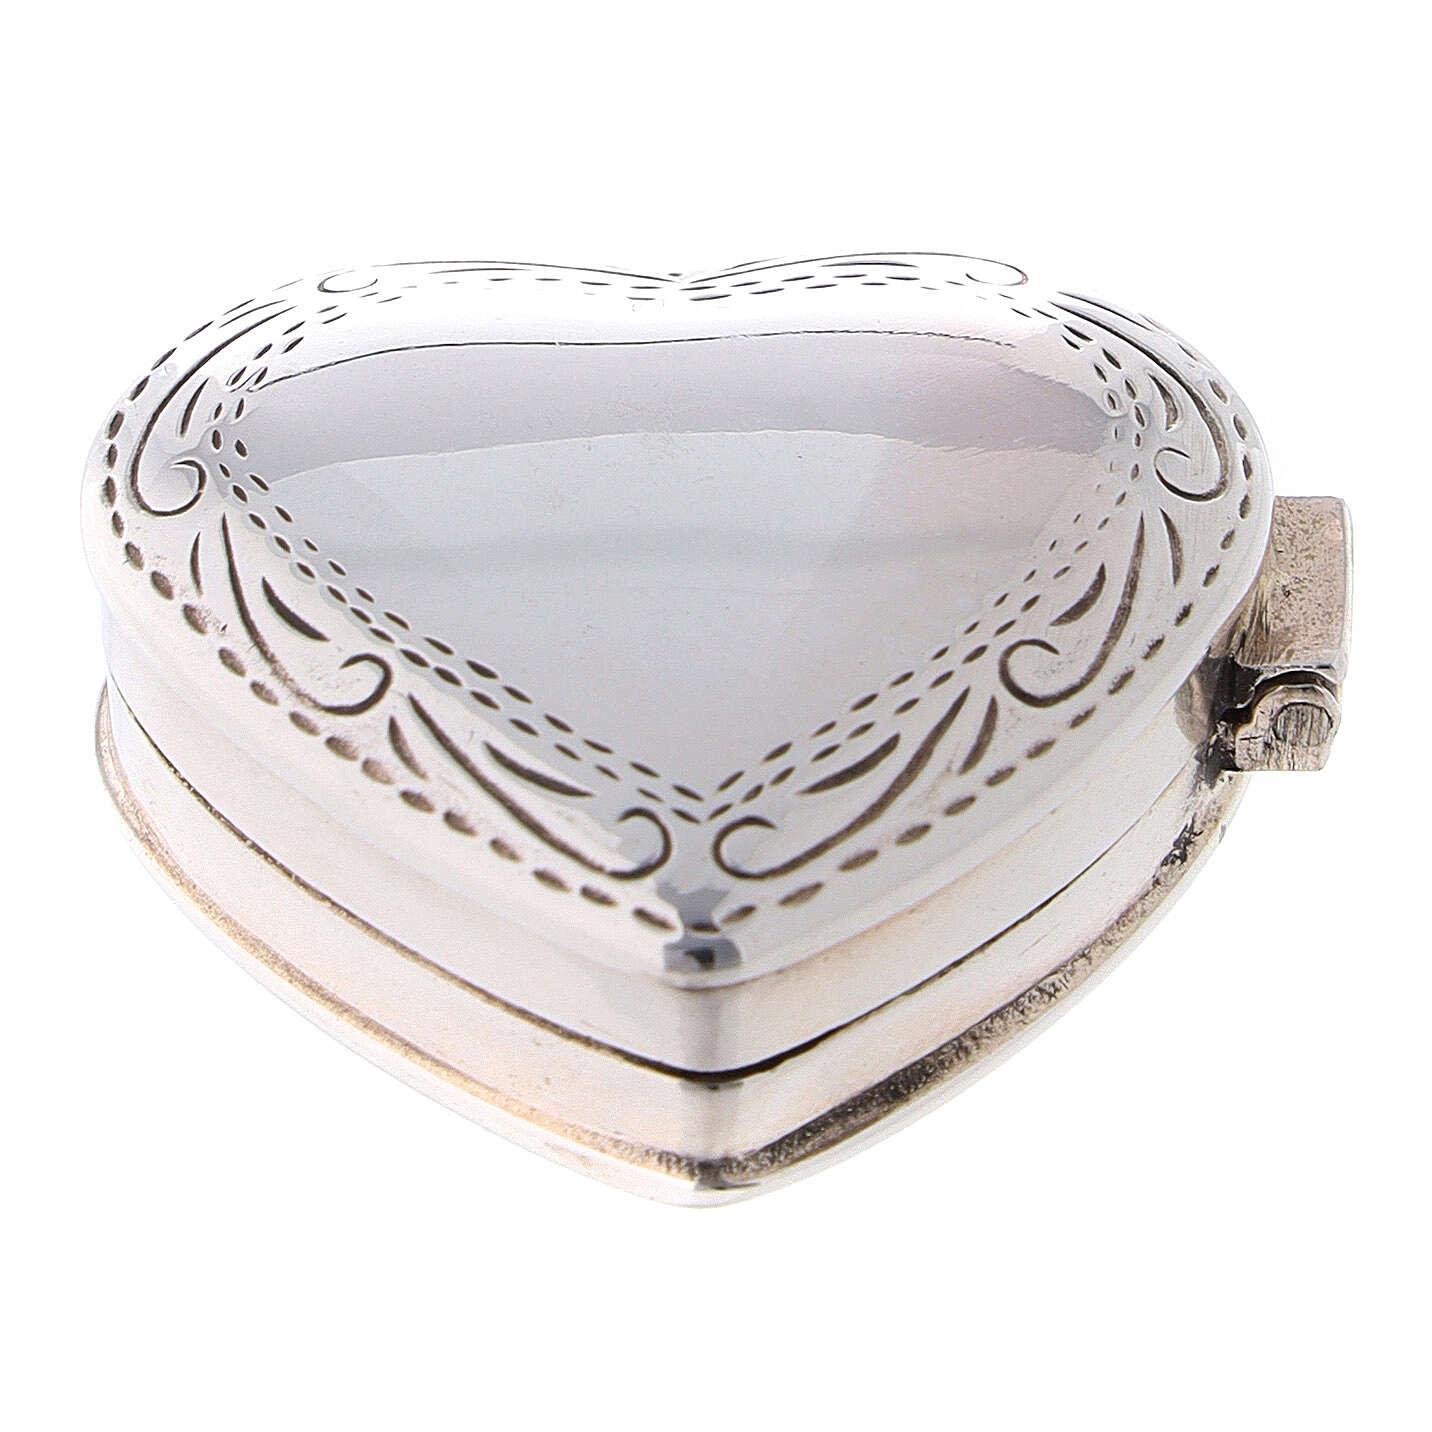 Portarosario cuore con incisioni in argento 925  4